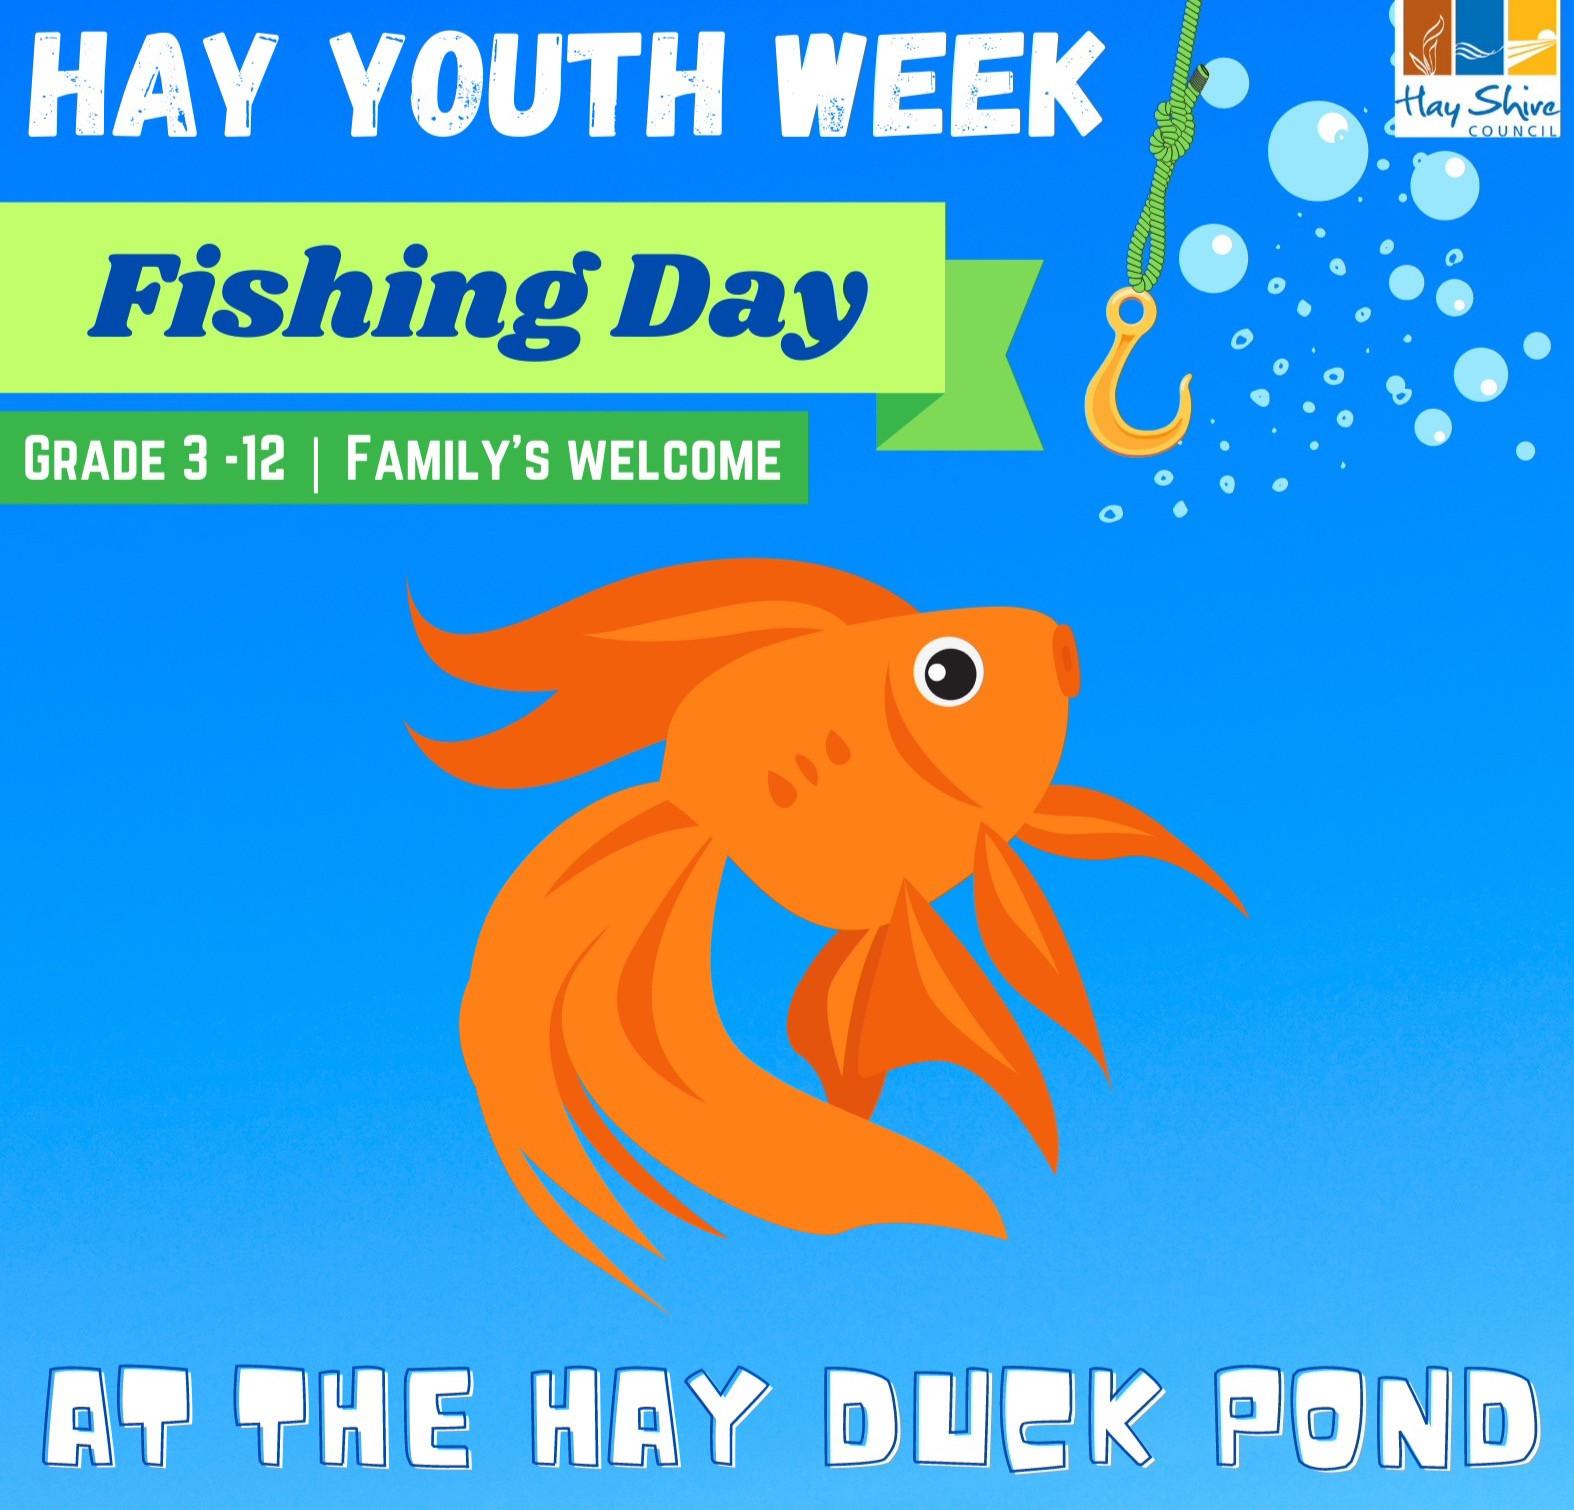 Hay Youth Week Fishing Day